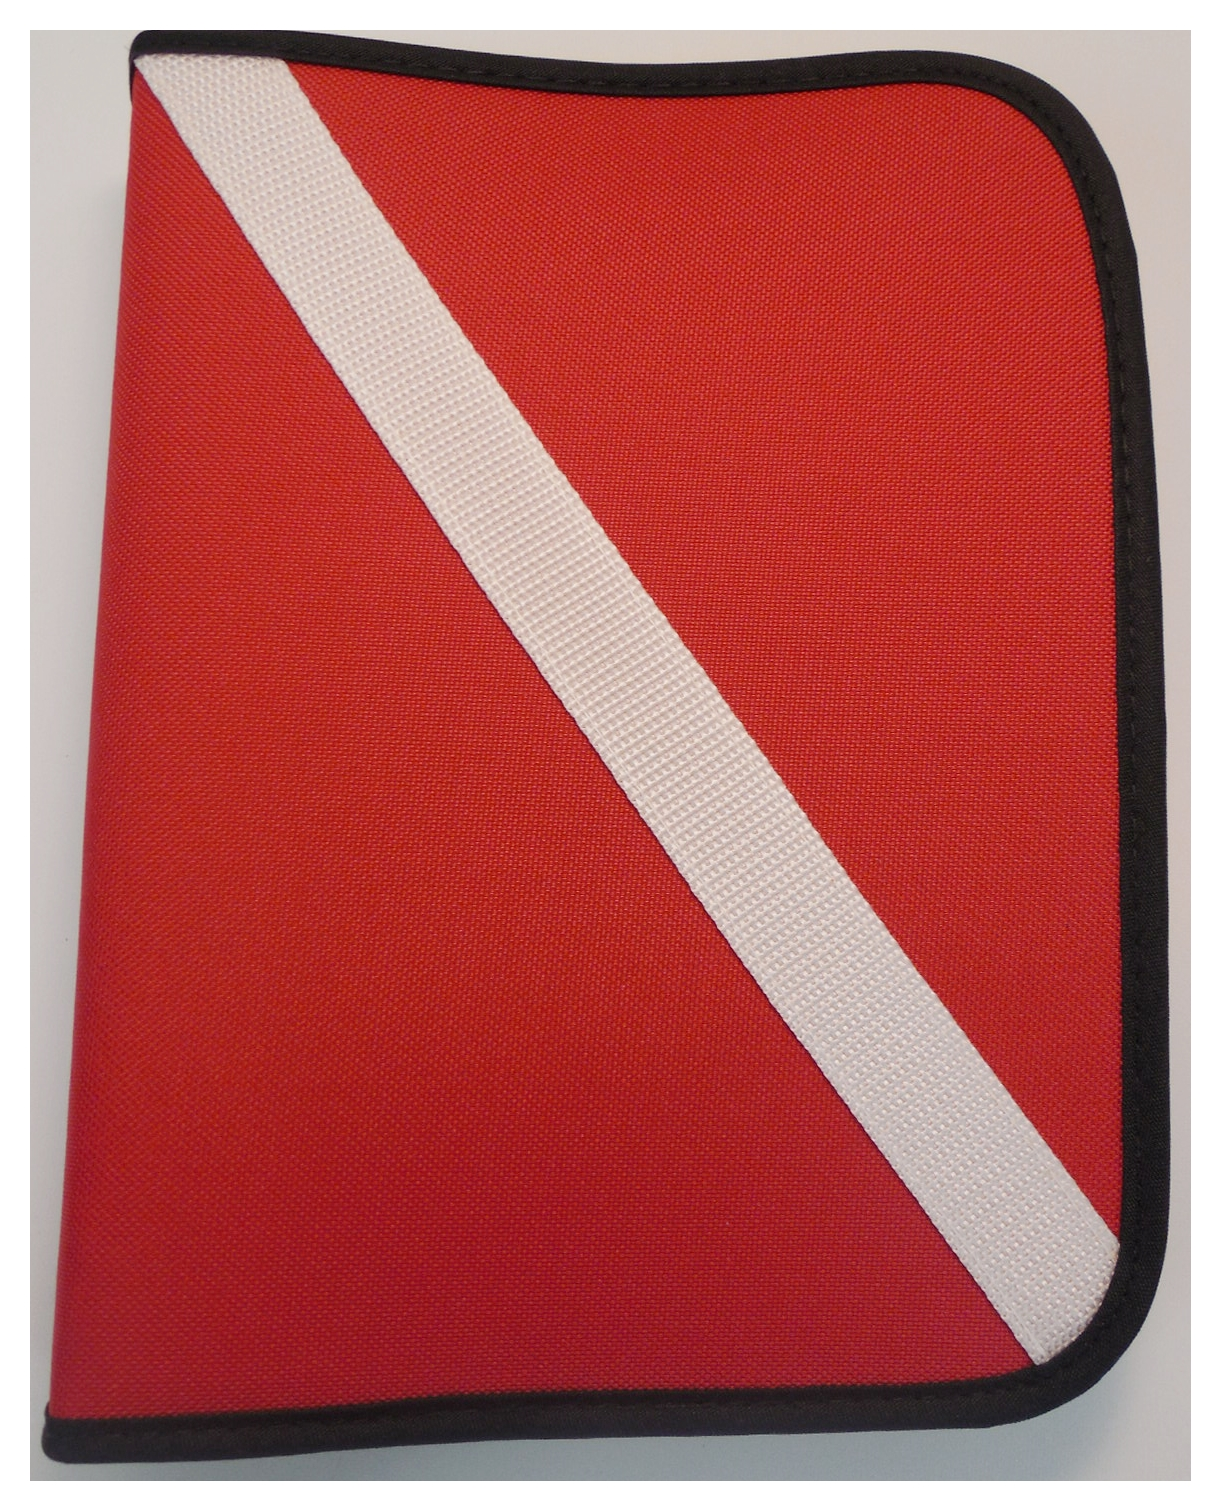 Innovative Scuba Dive Flag 3-Ring Dive Log Red/White